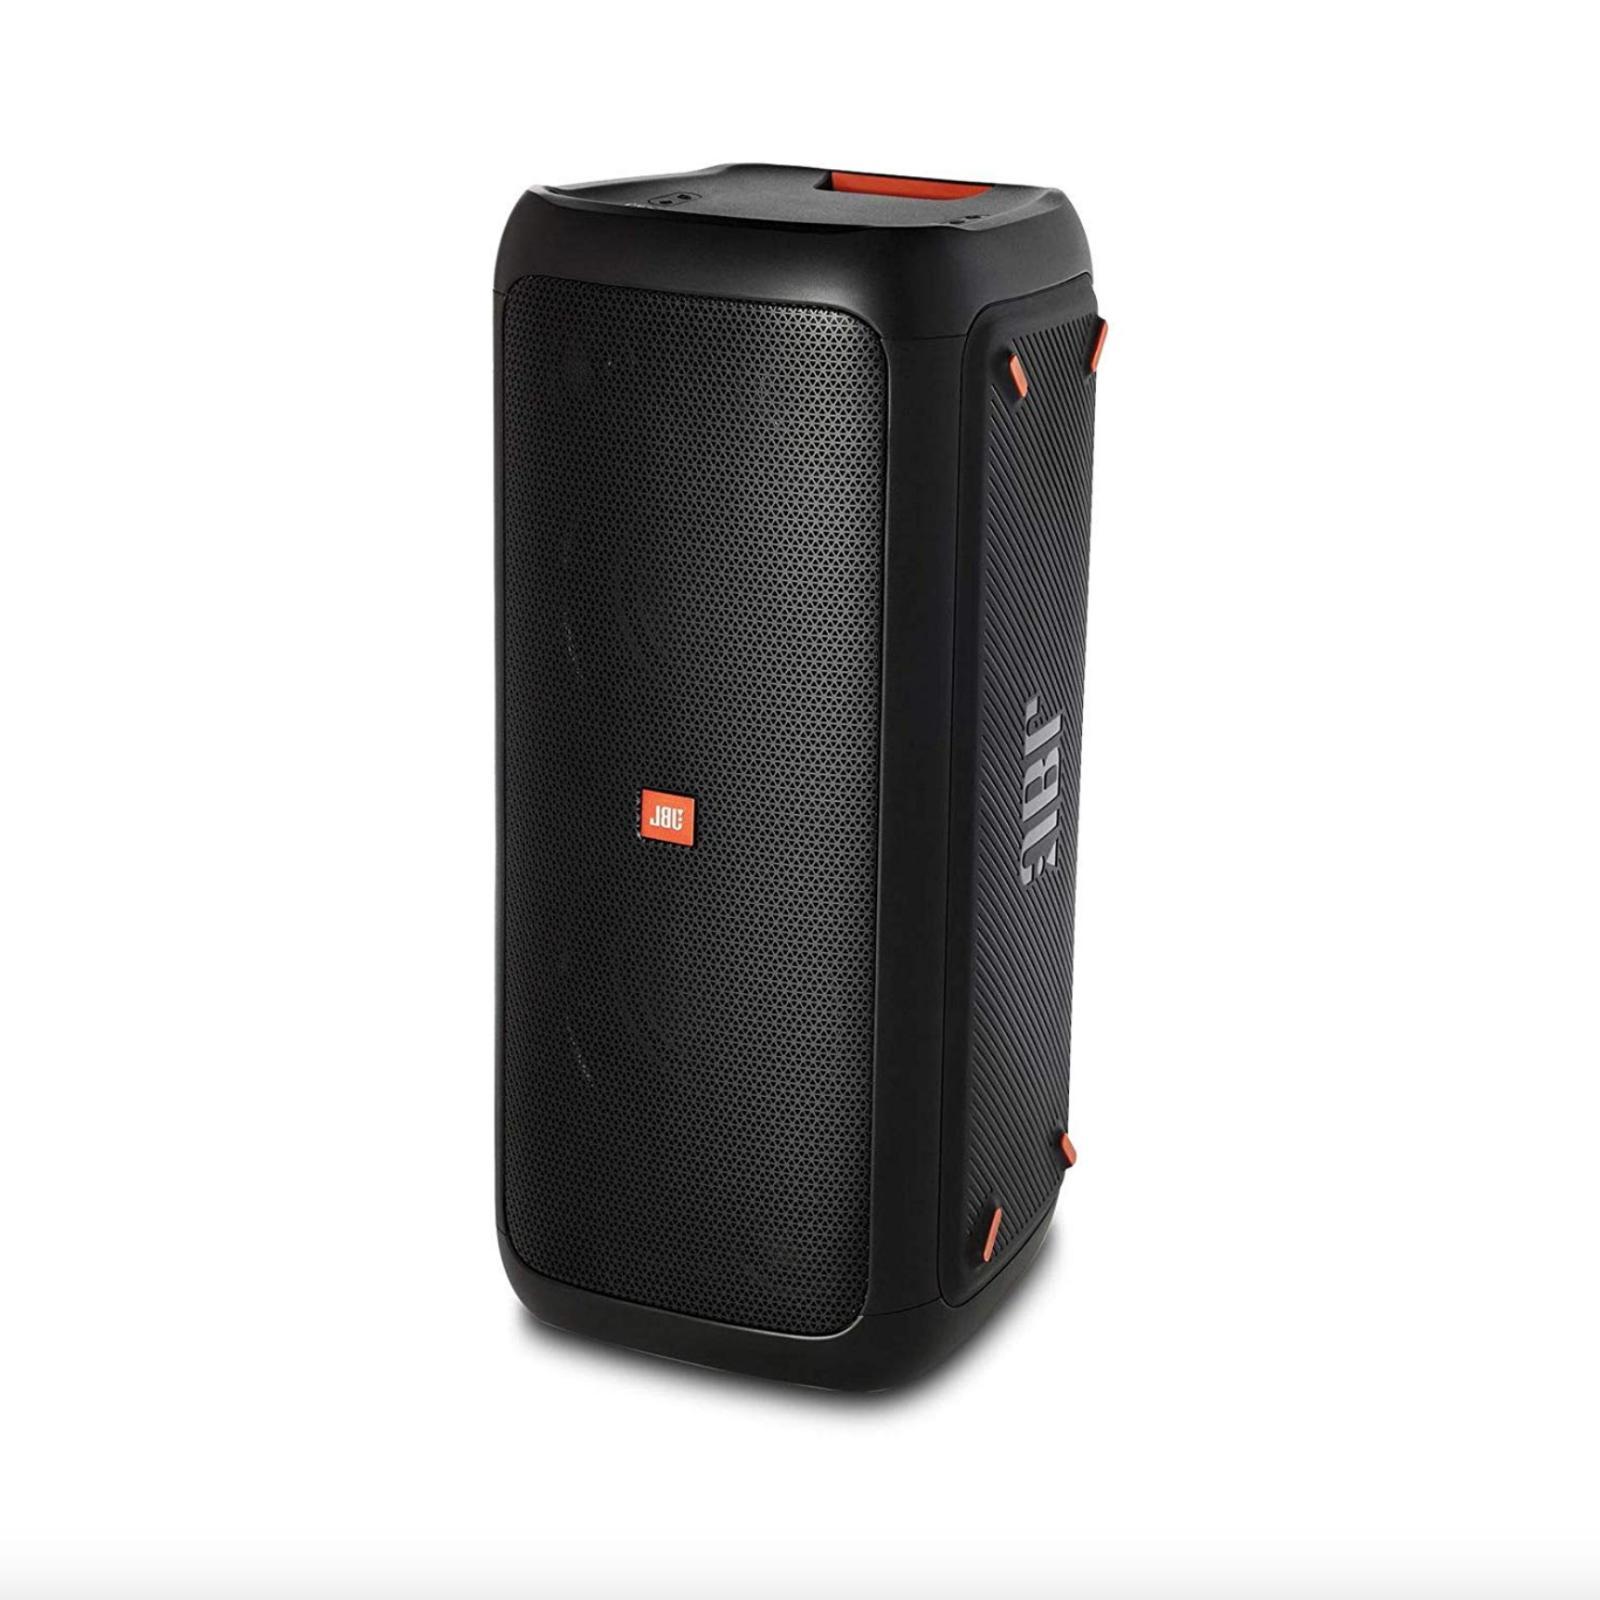 JBL Speaker Waterproof Favors New